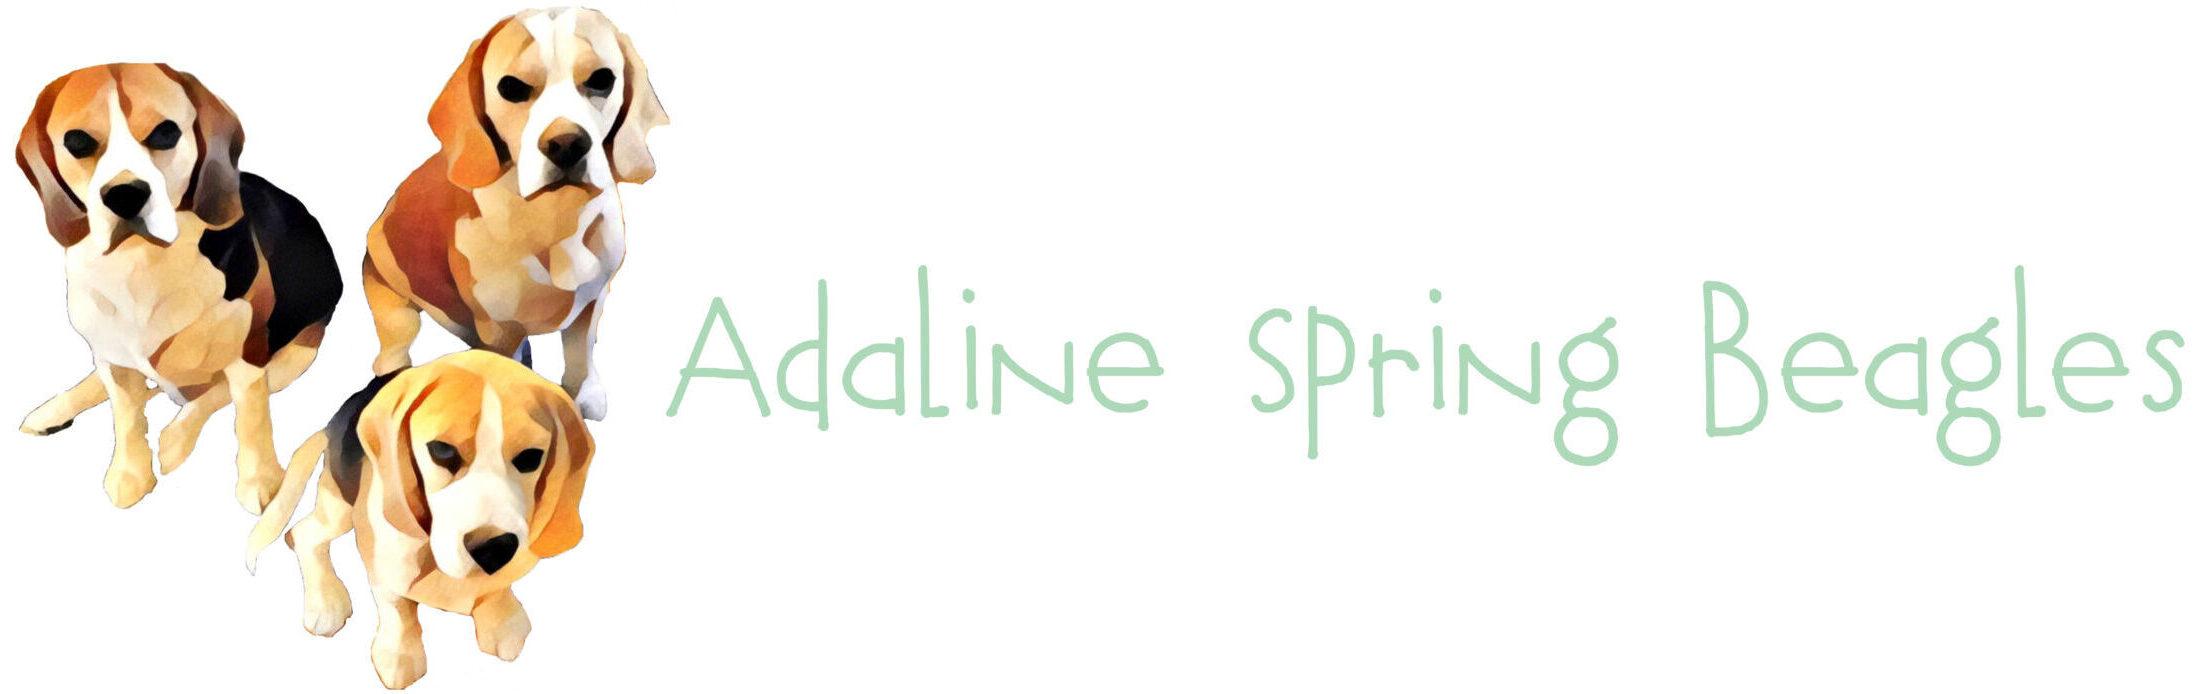 Adaline Spring Beagles